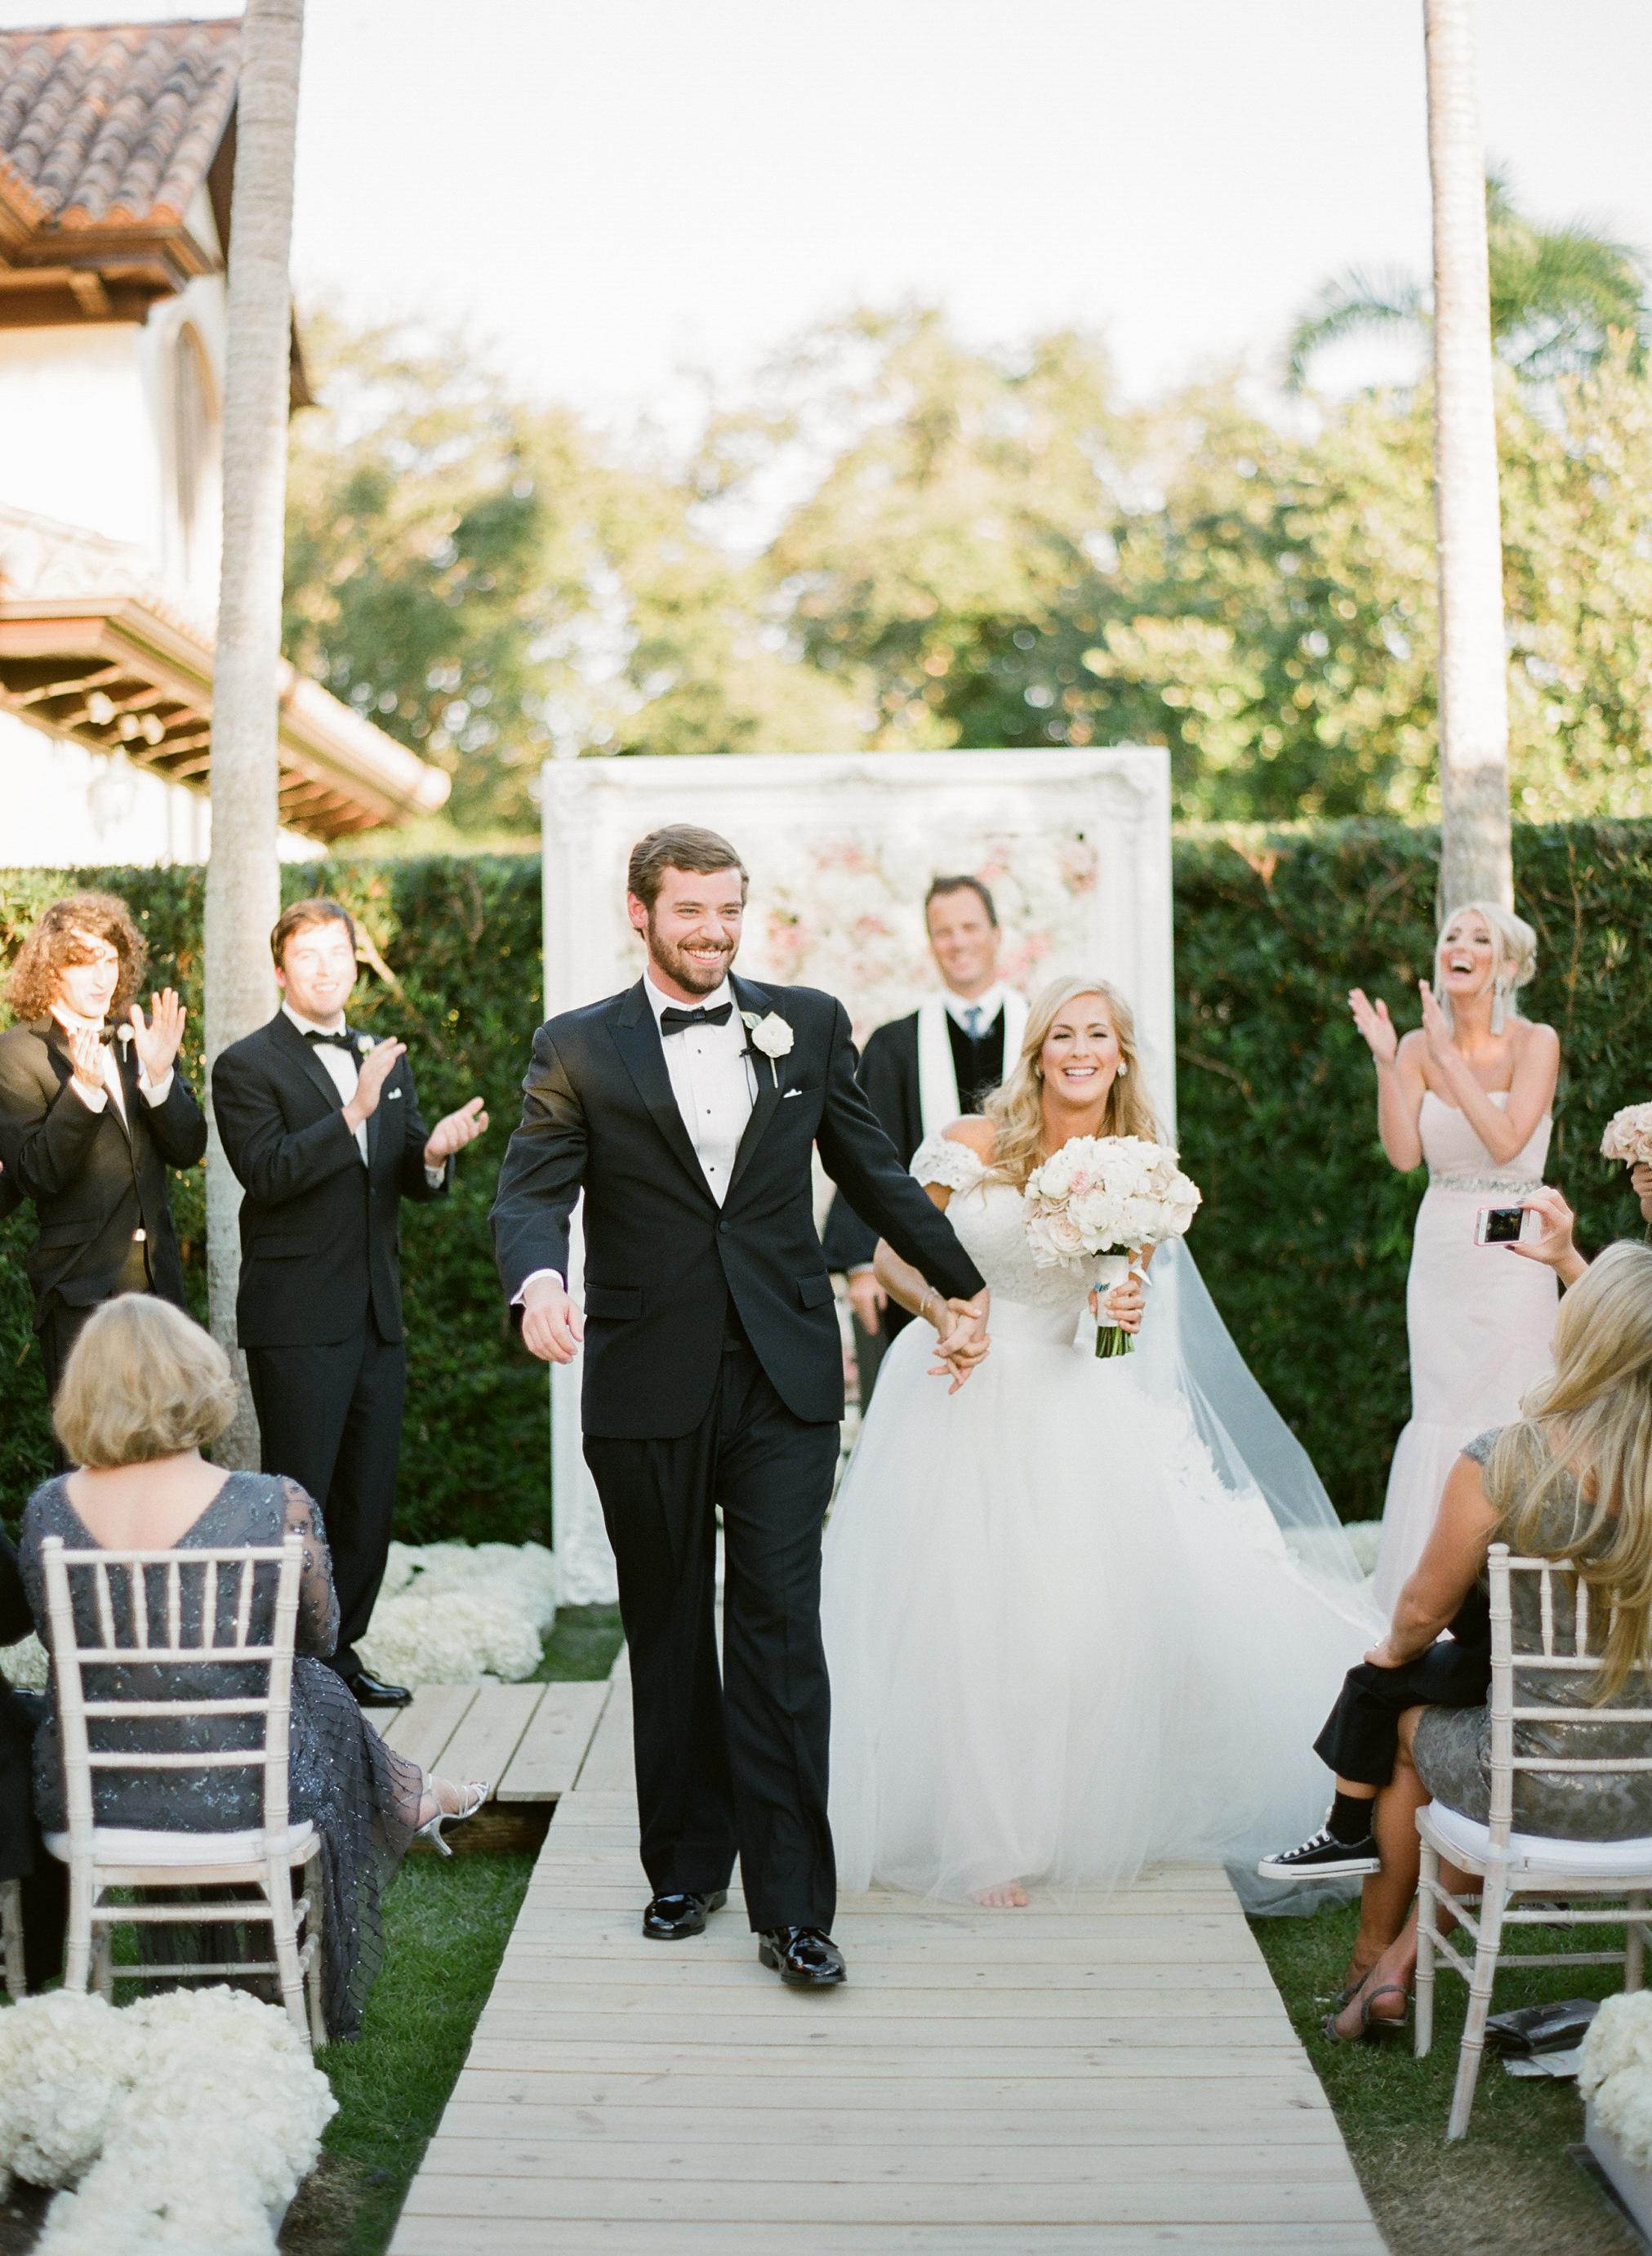 Ceci_New_York_Florida_Wedding_Style_Bride_Watercolor_Real_Custom_Luxury_77.jpg